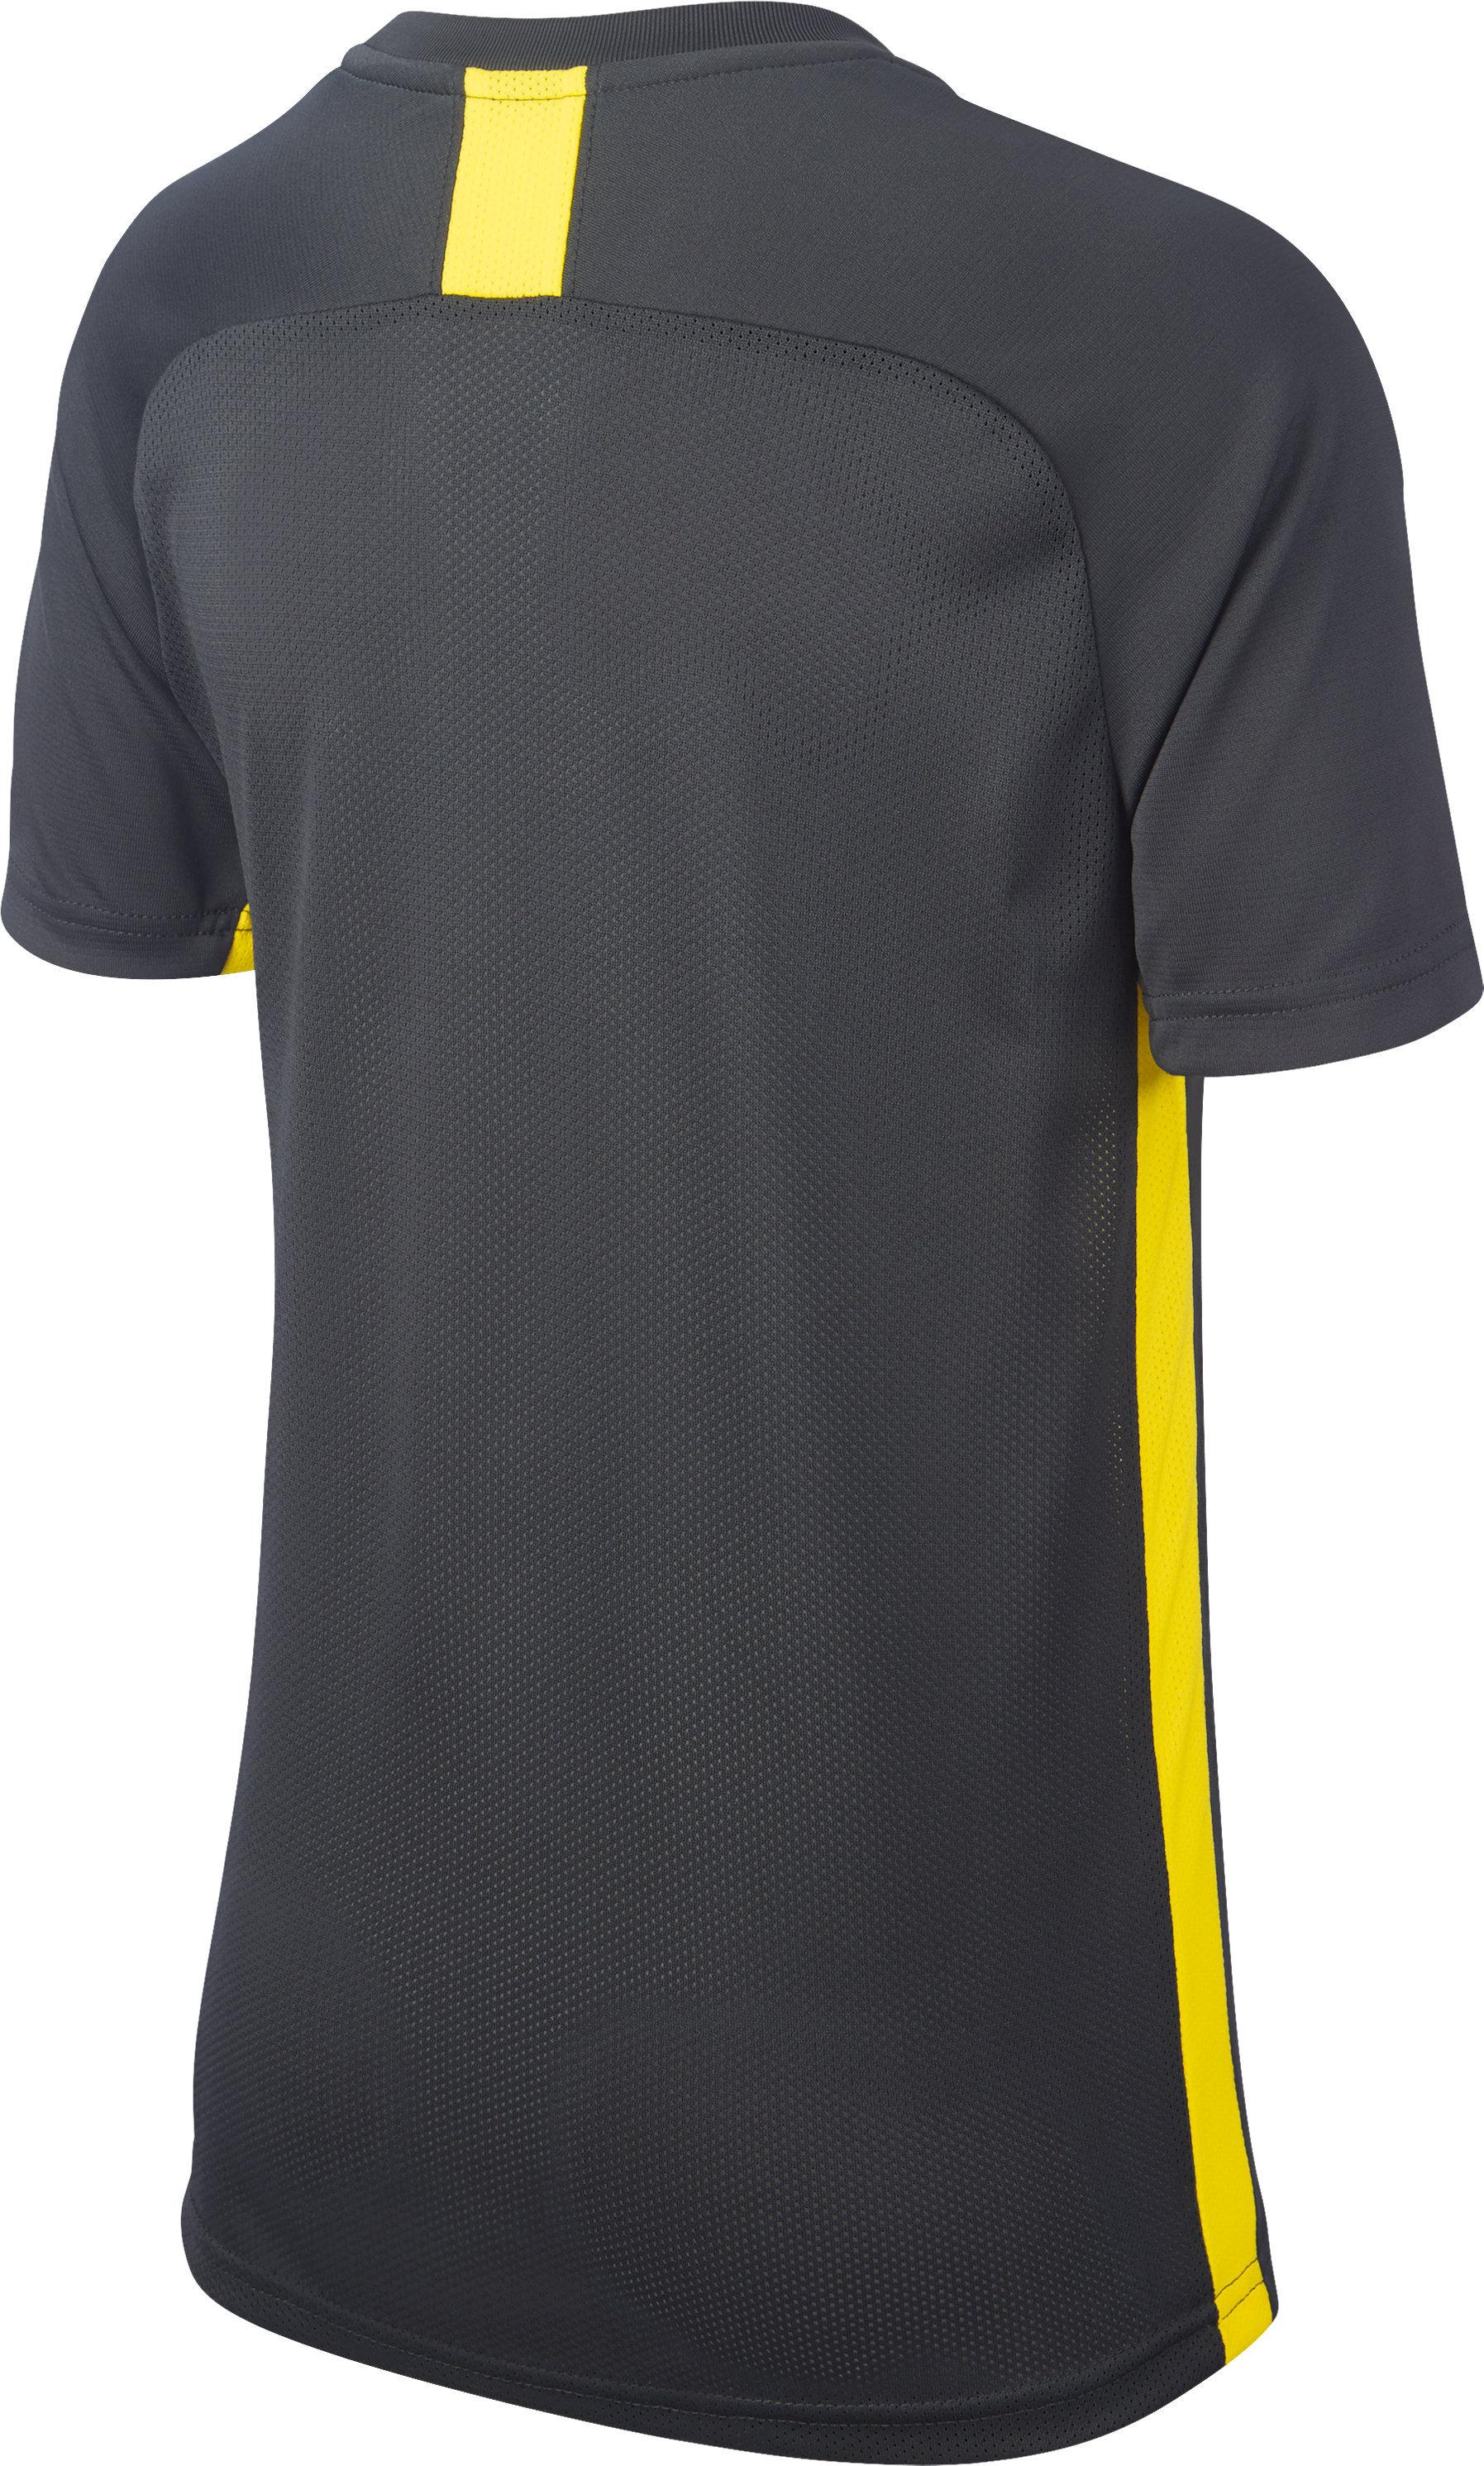 Fit Academy Dri Camiseta Plomo Nike JTlF1cK